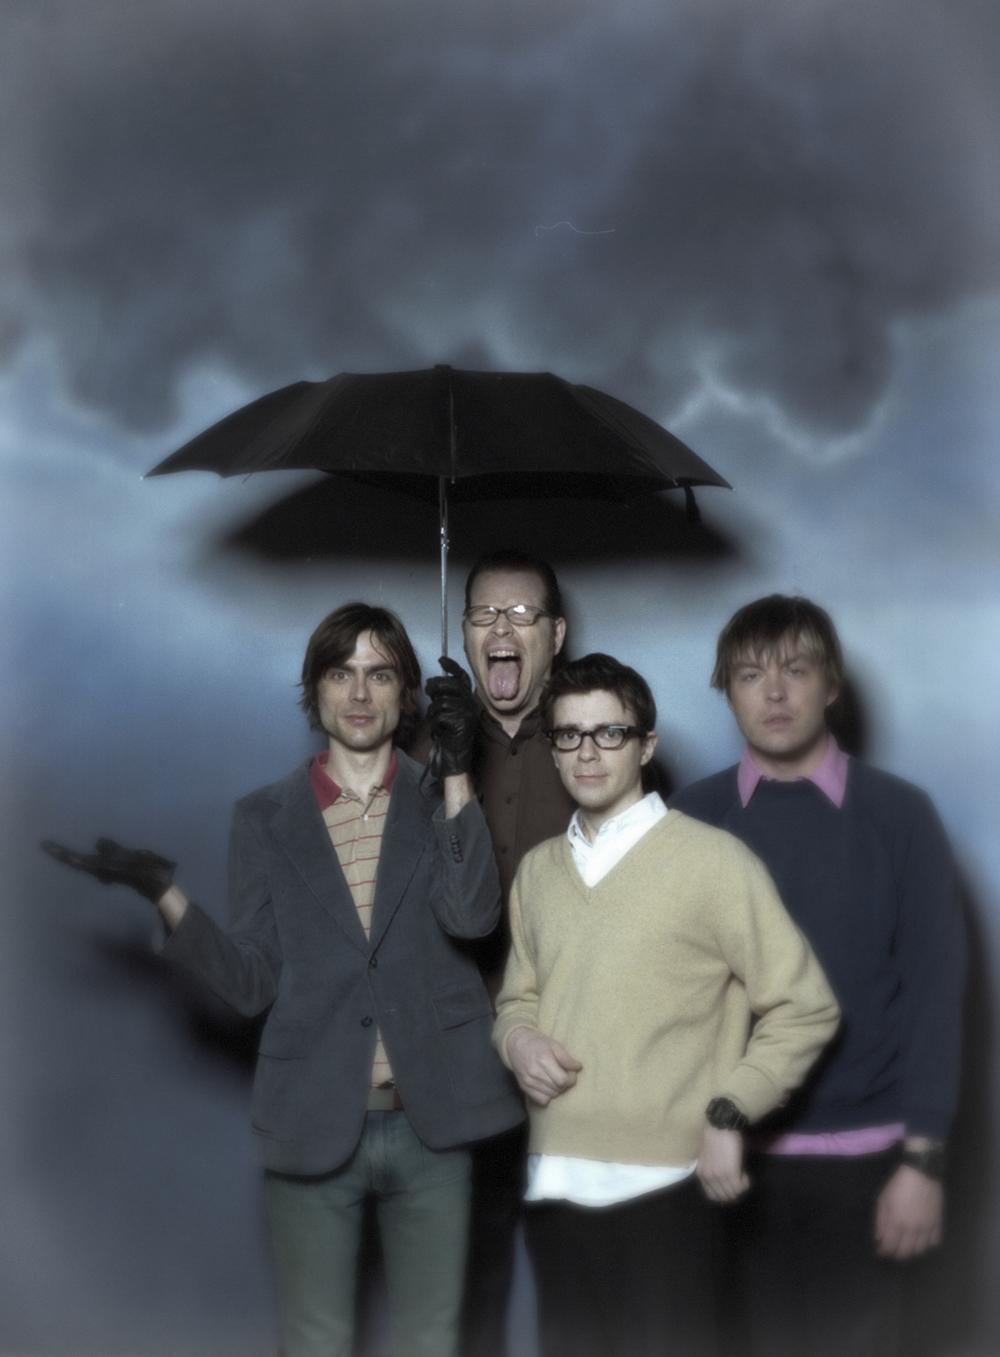 Weezer. Rivers Cuomo, Mikey Welsh, Patrick Wilson, Brian Bell. Photo bySean Murphy